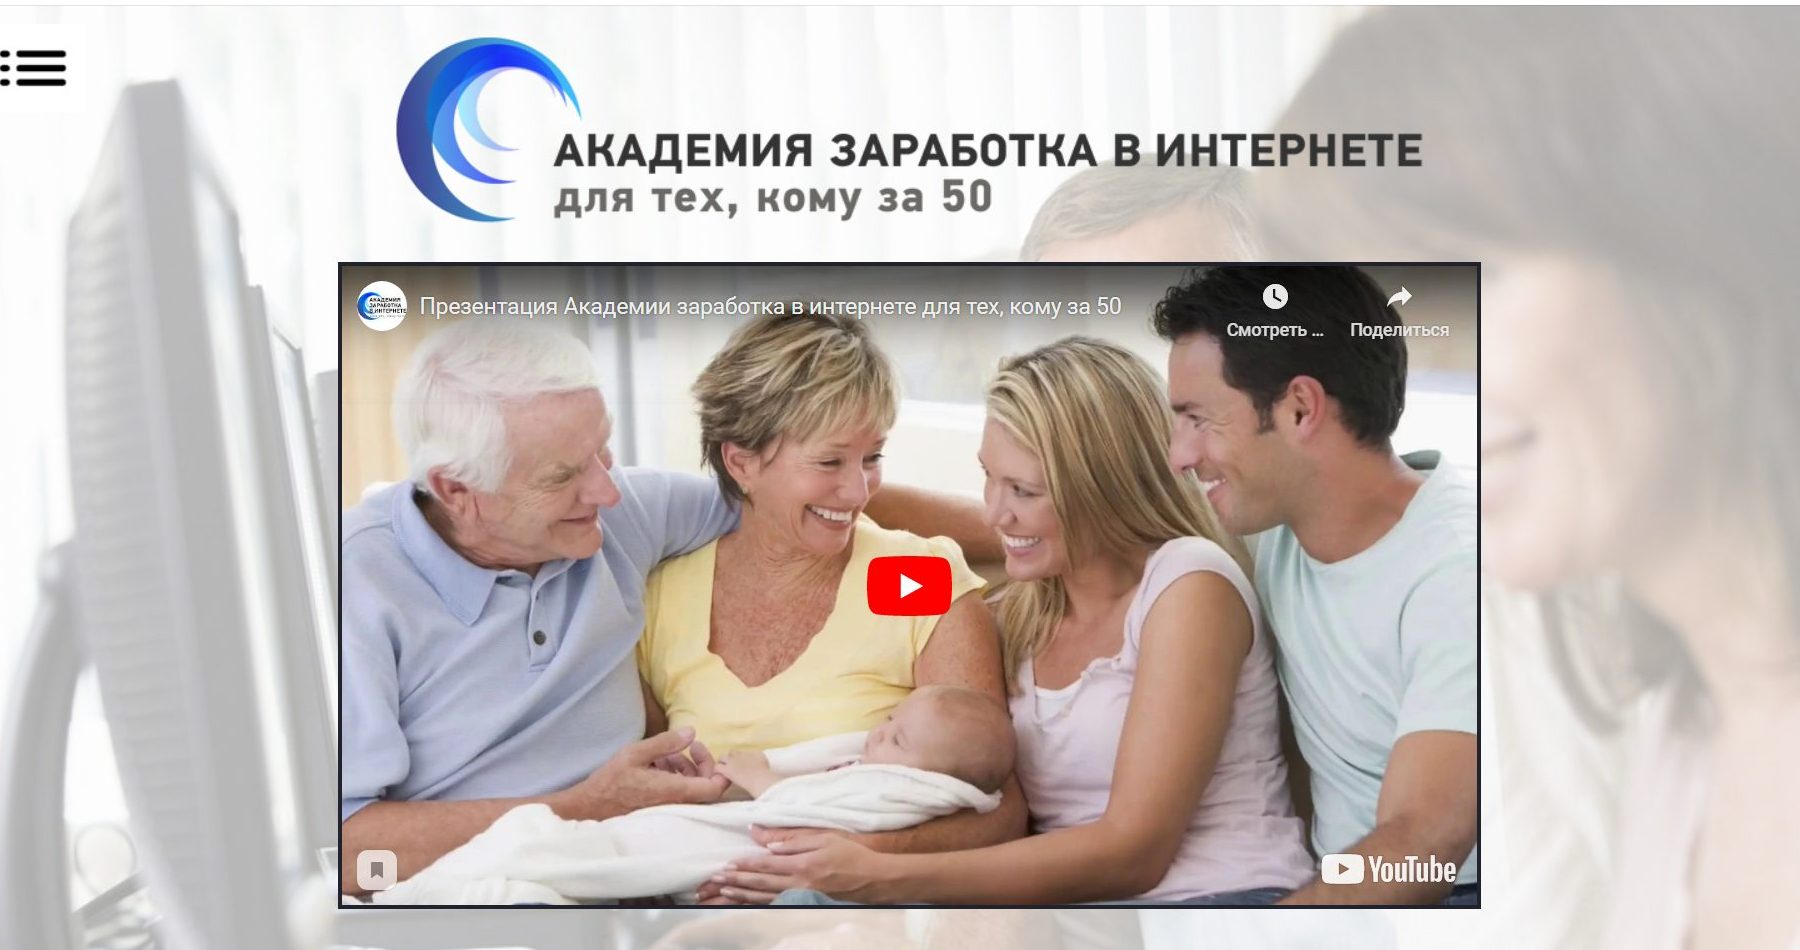 академия заработка 50 видео